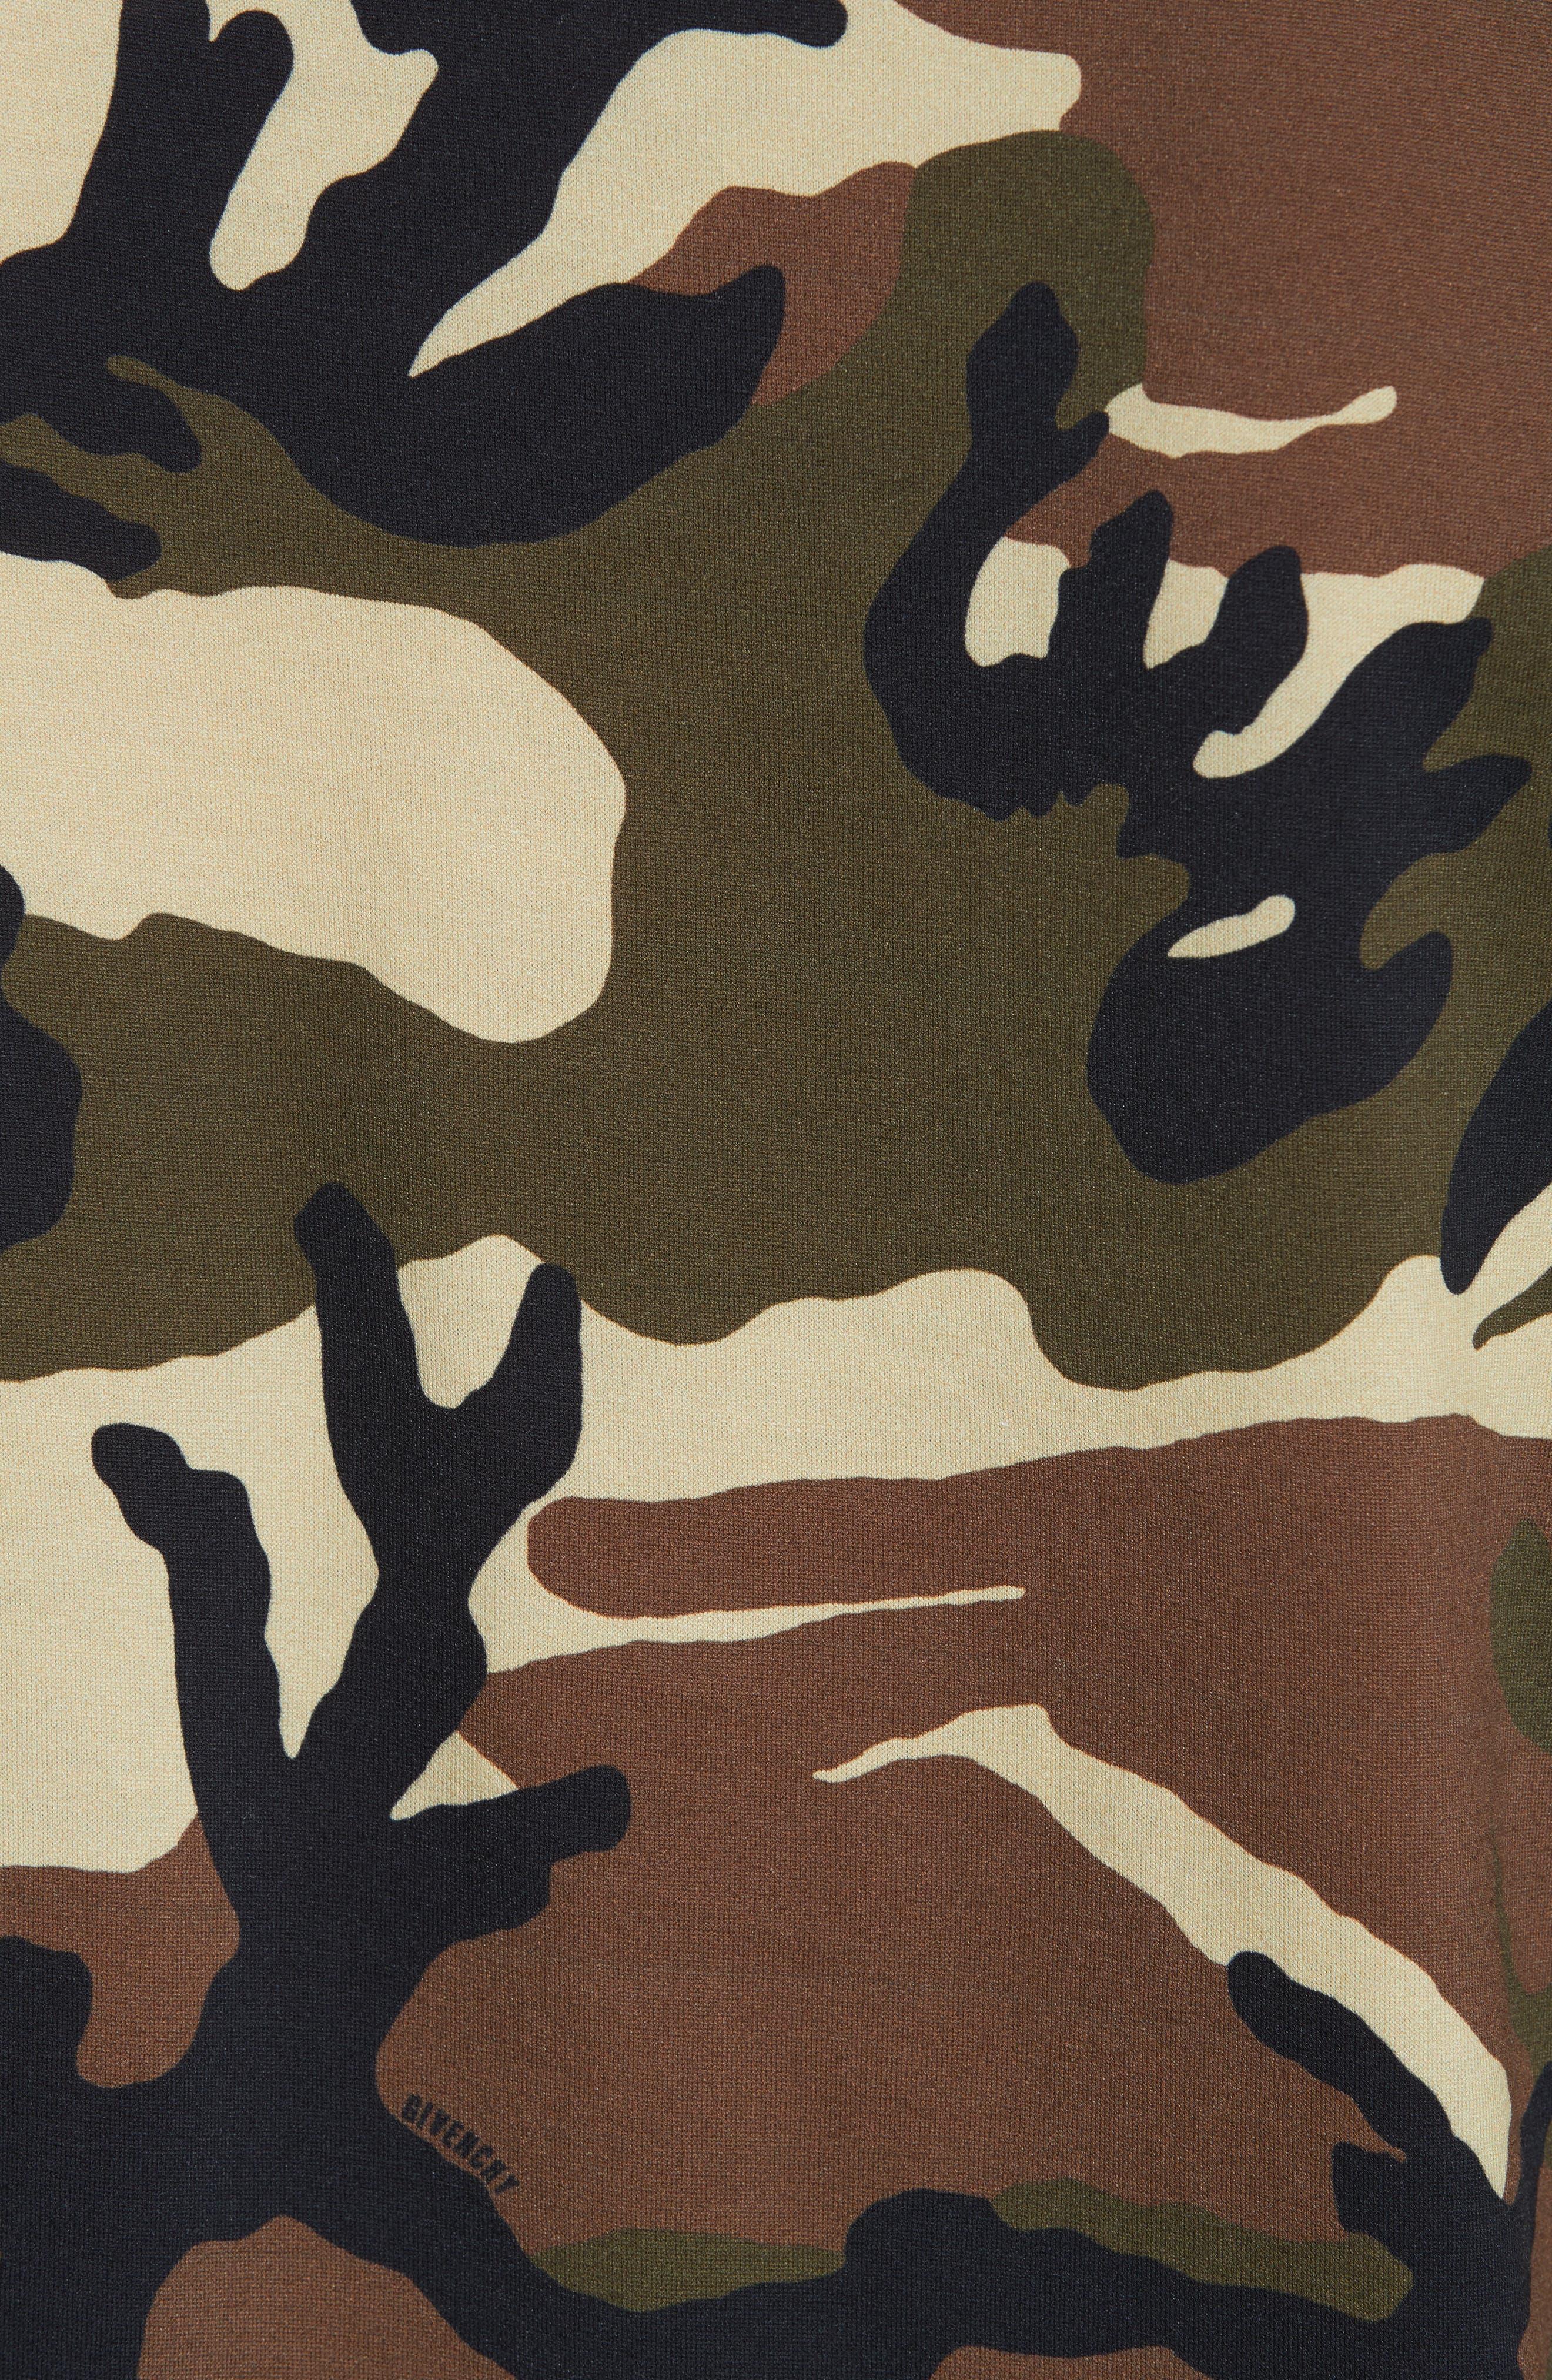 Extra Trim Fit Camo Print T-Shirt,                             Alternate thumbnail 5, color,                             305